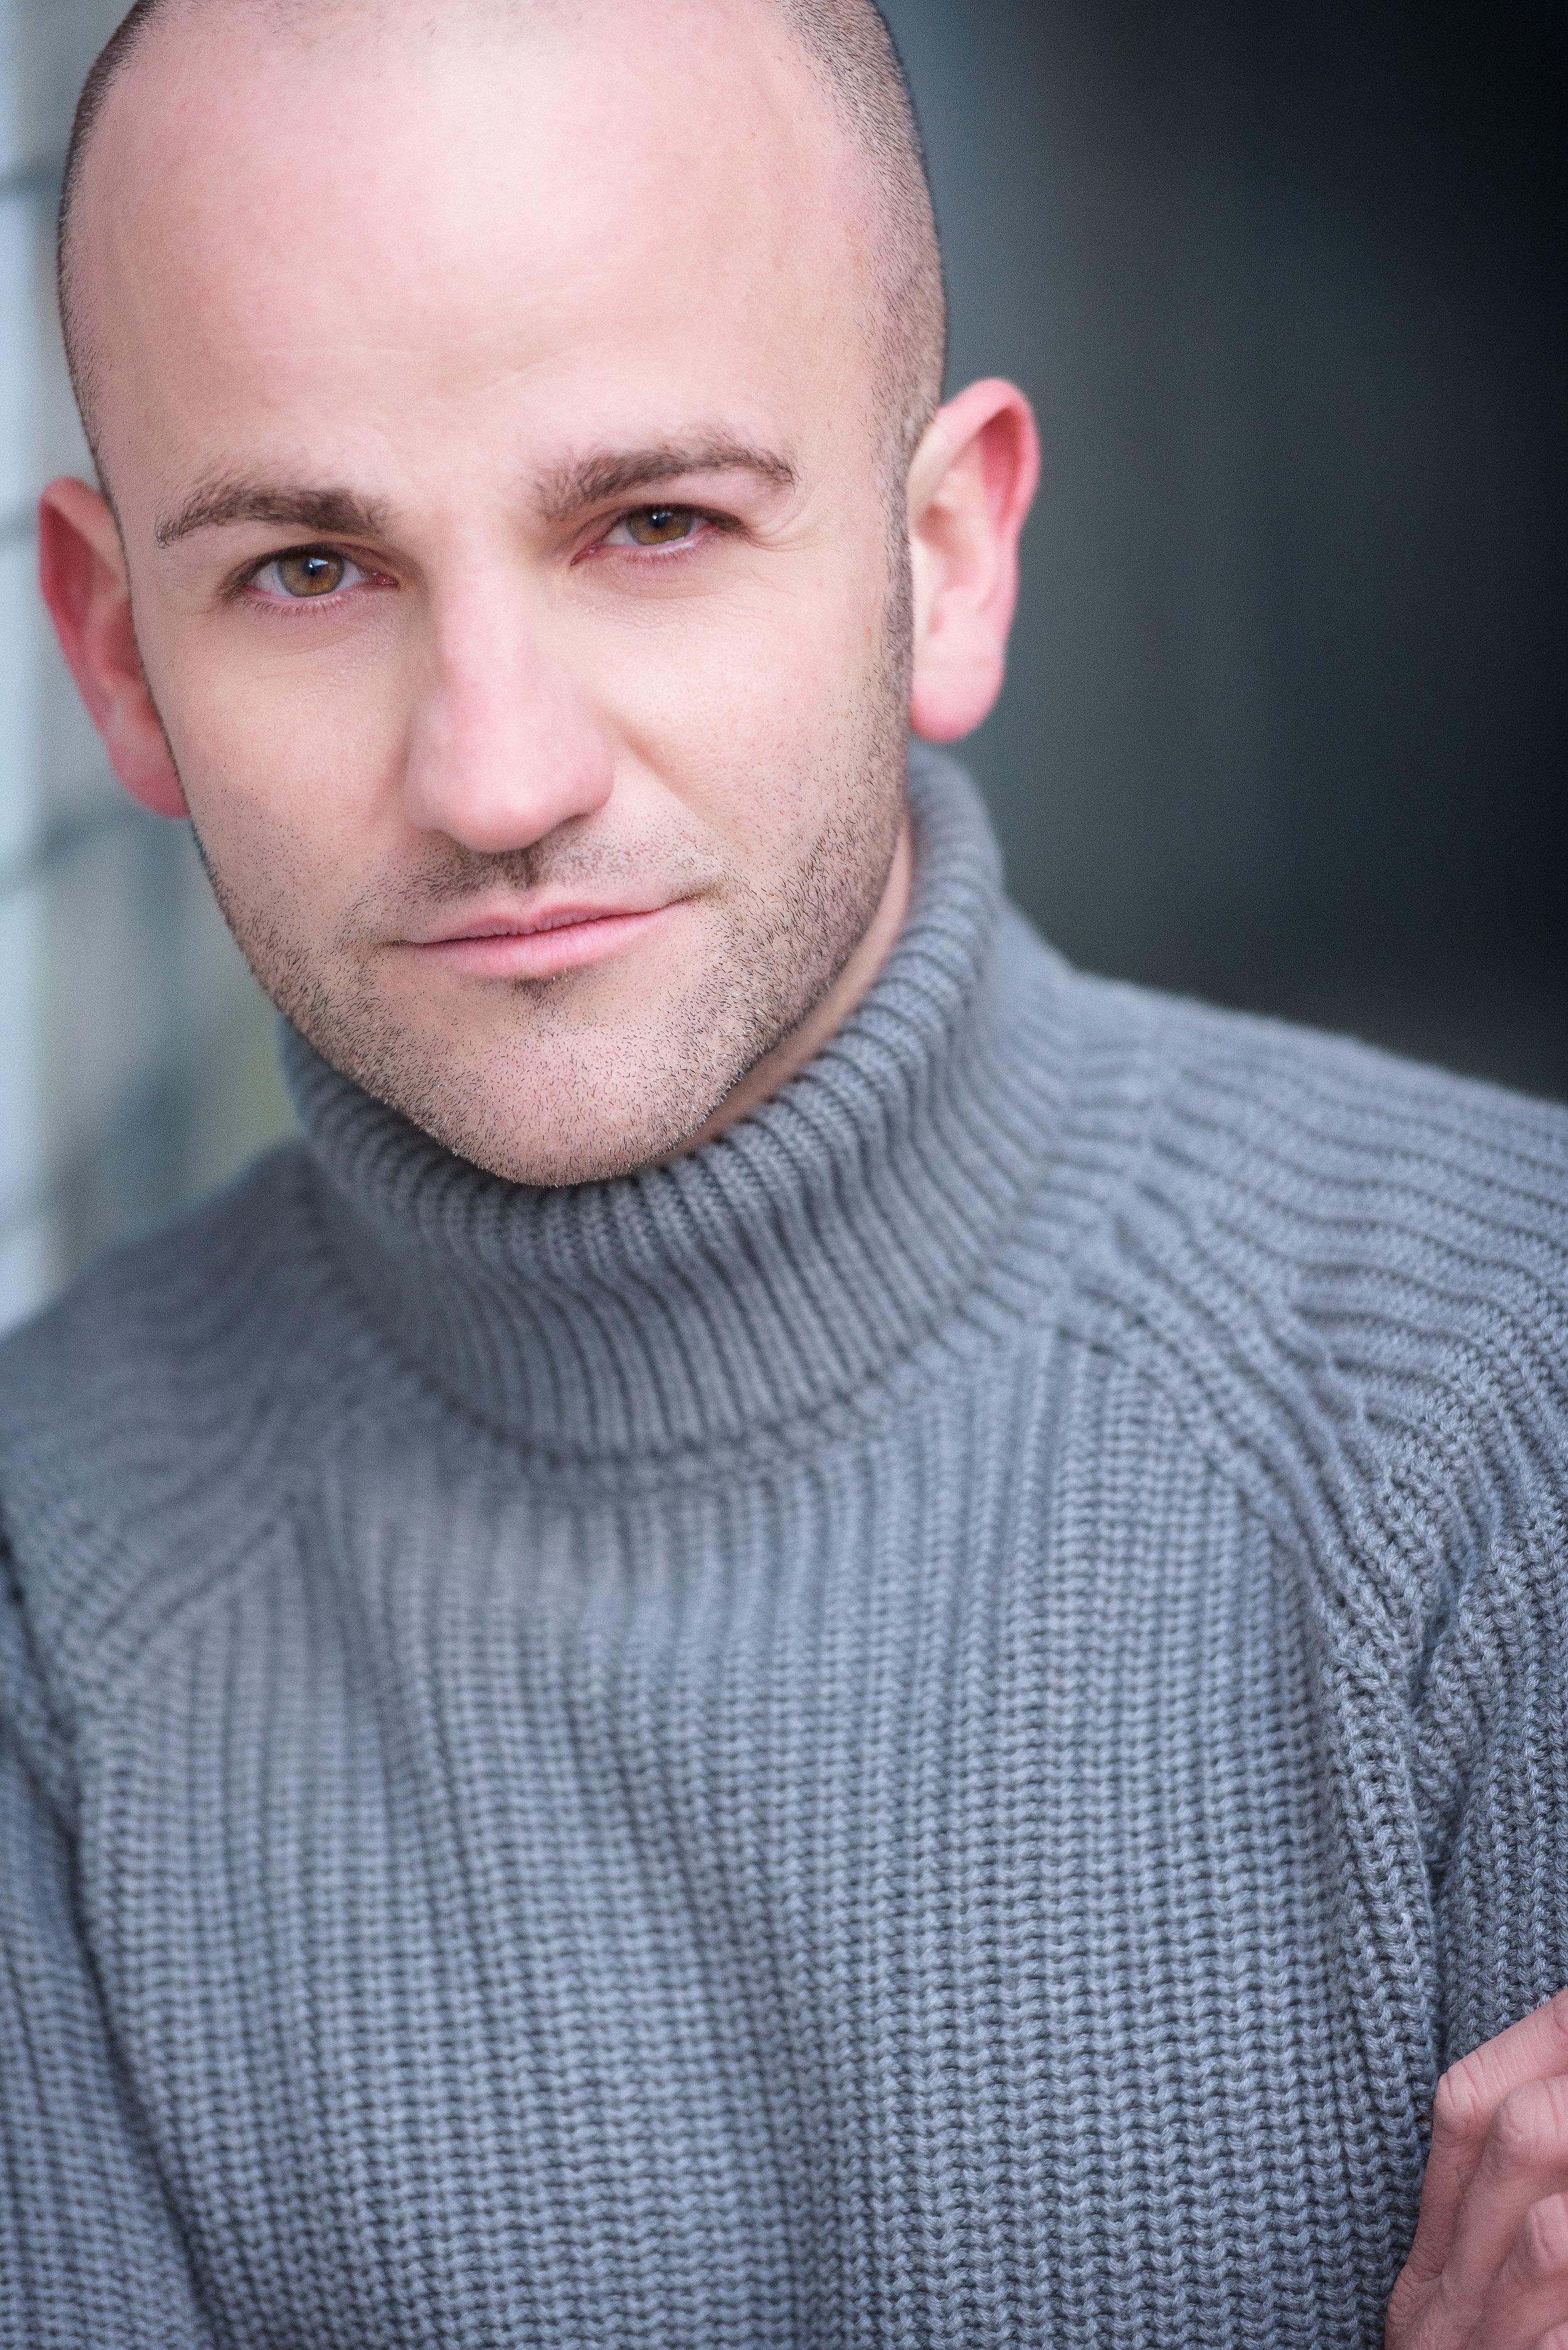 Dominic-Ellis-Peckham-003.jpg